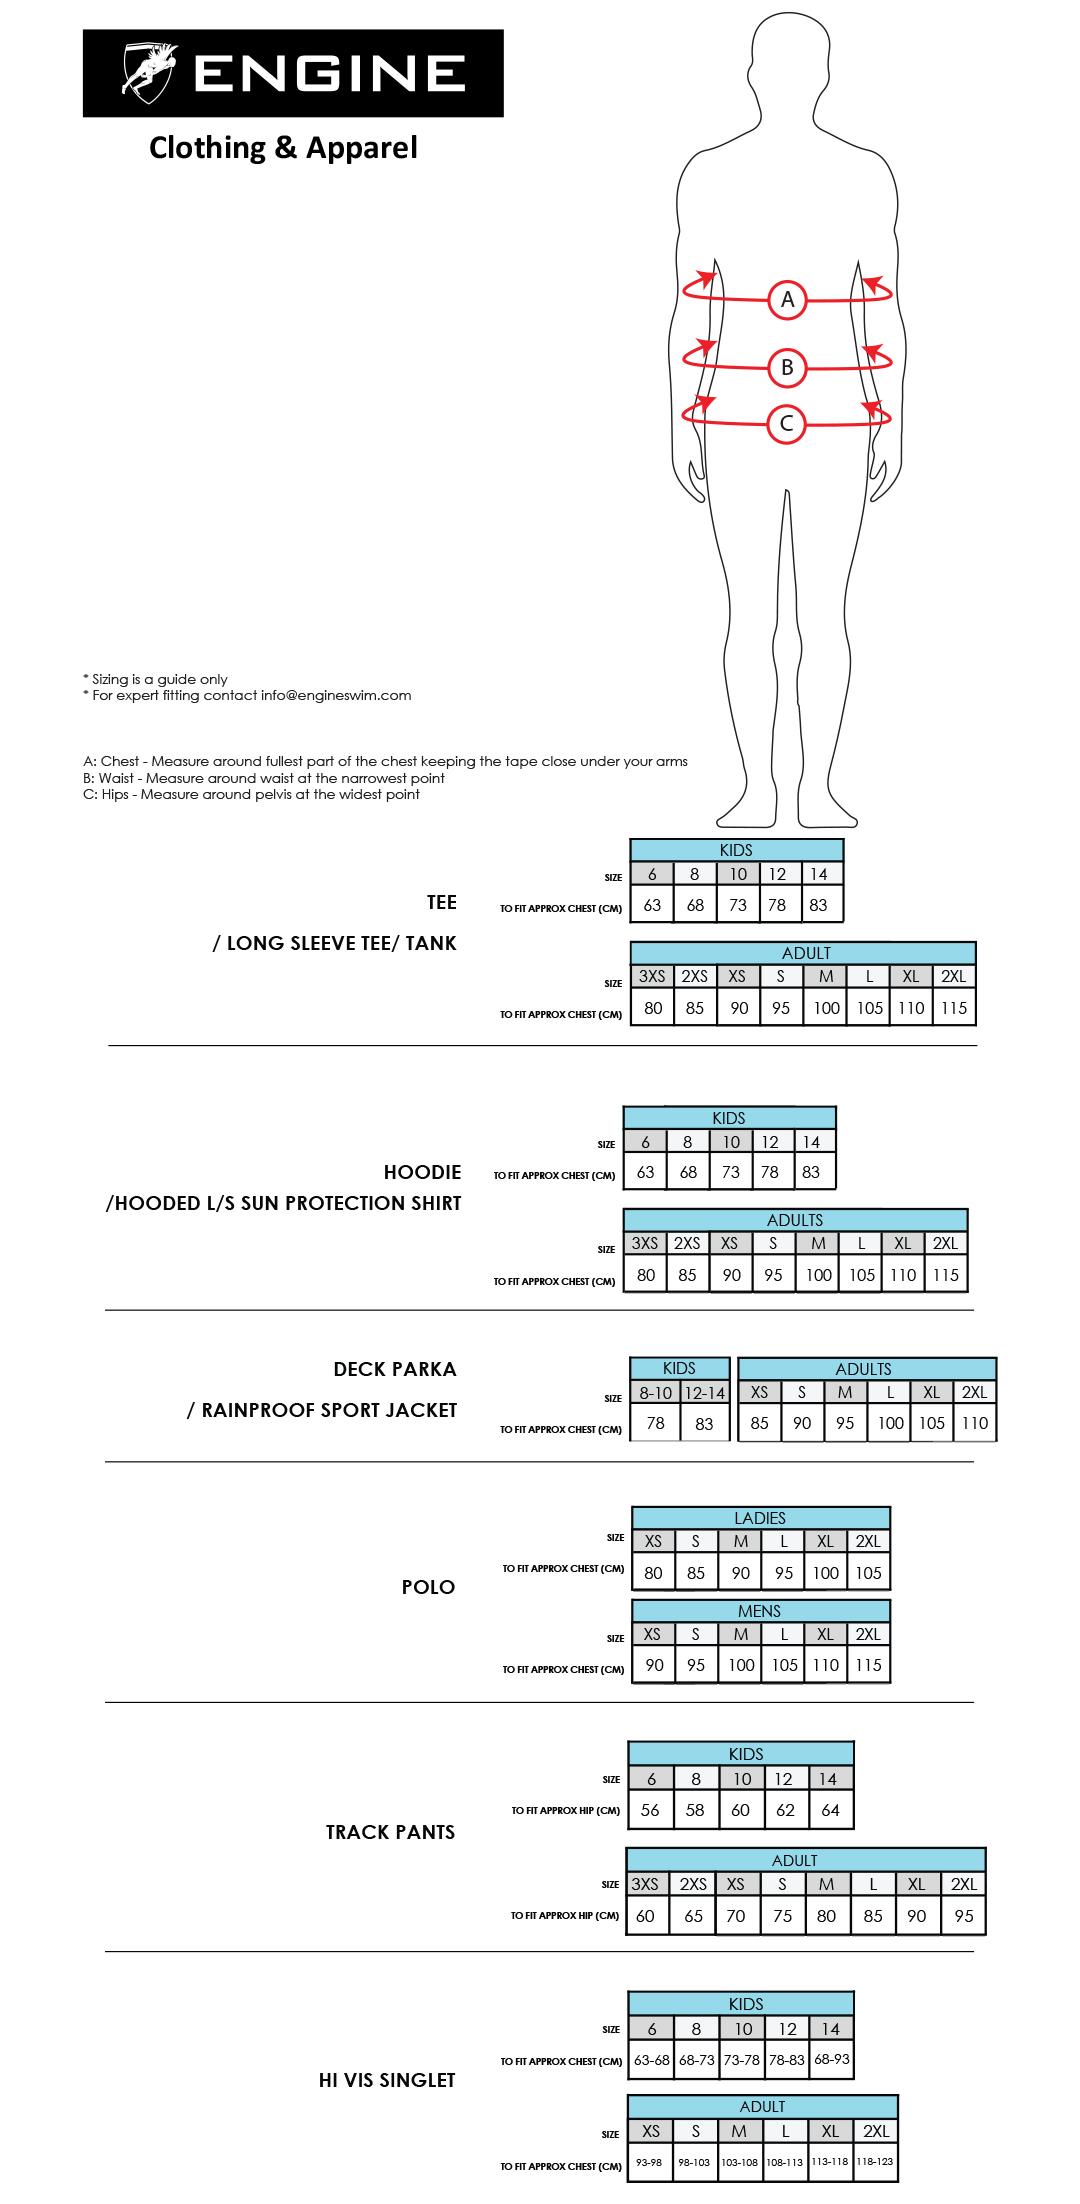 engine-retail-clothing-apparel-size-chart-v2.jpg